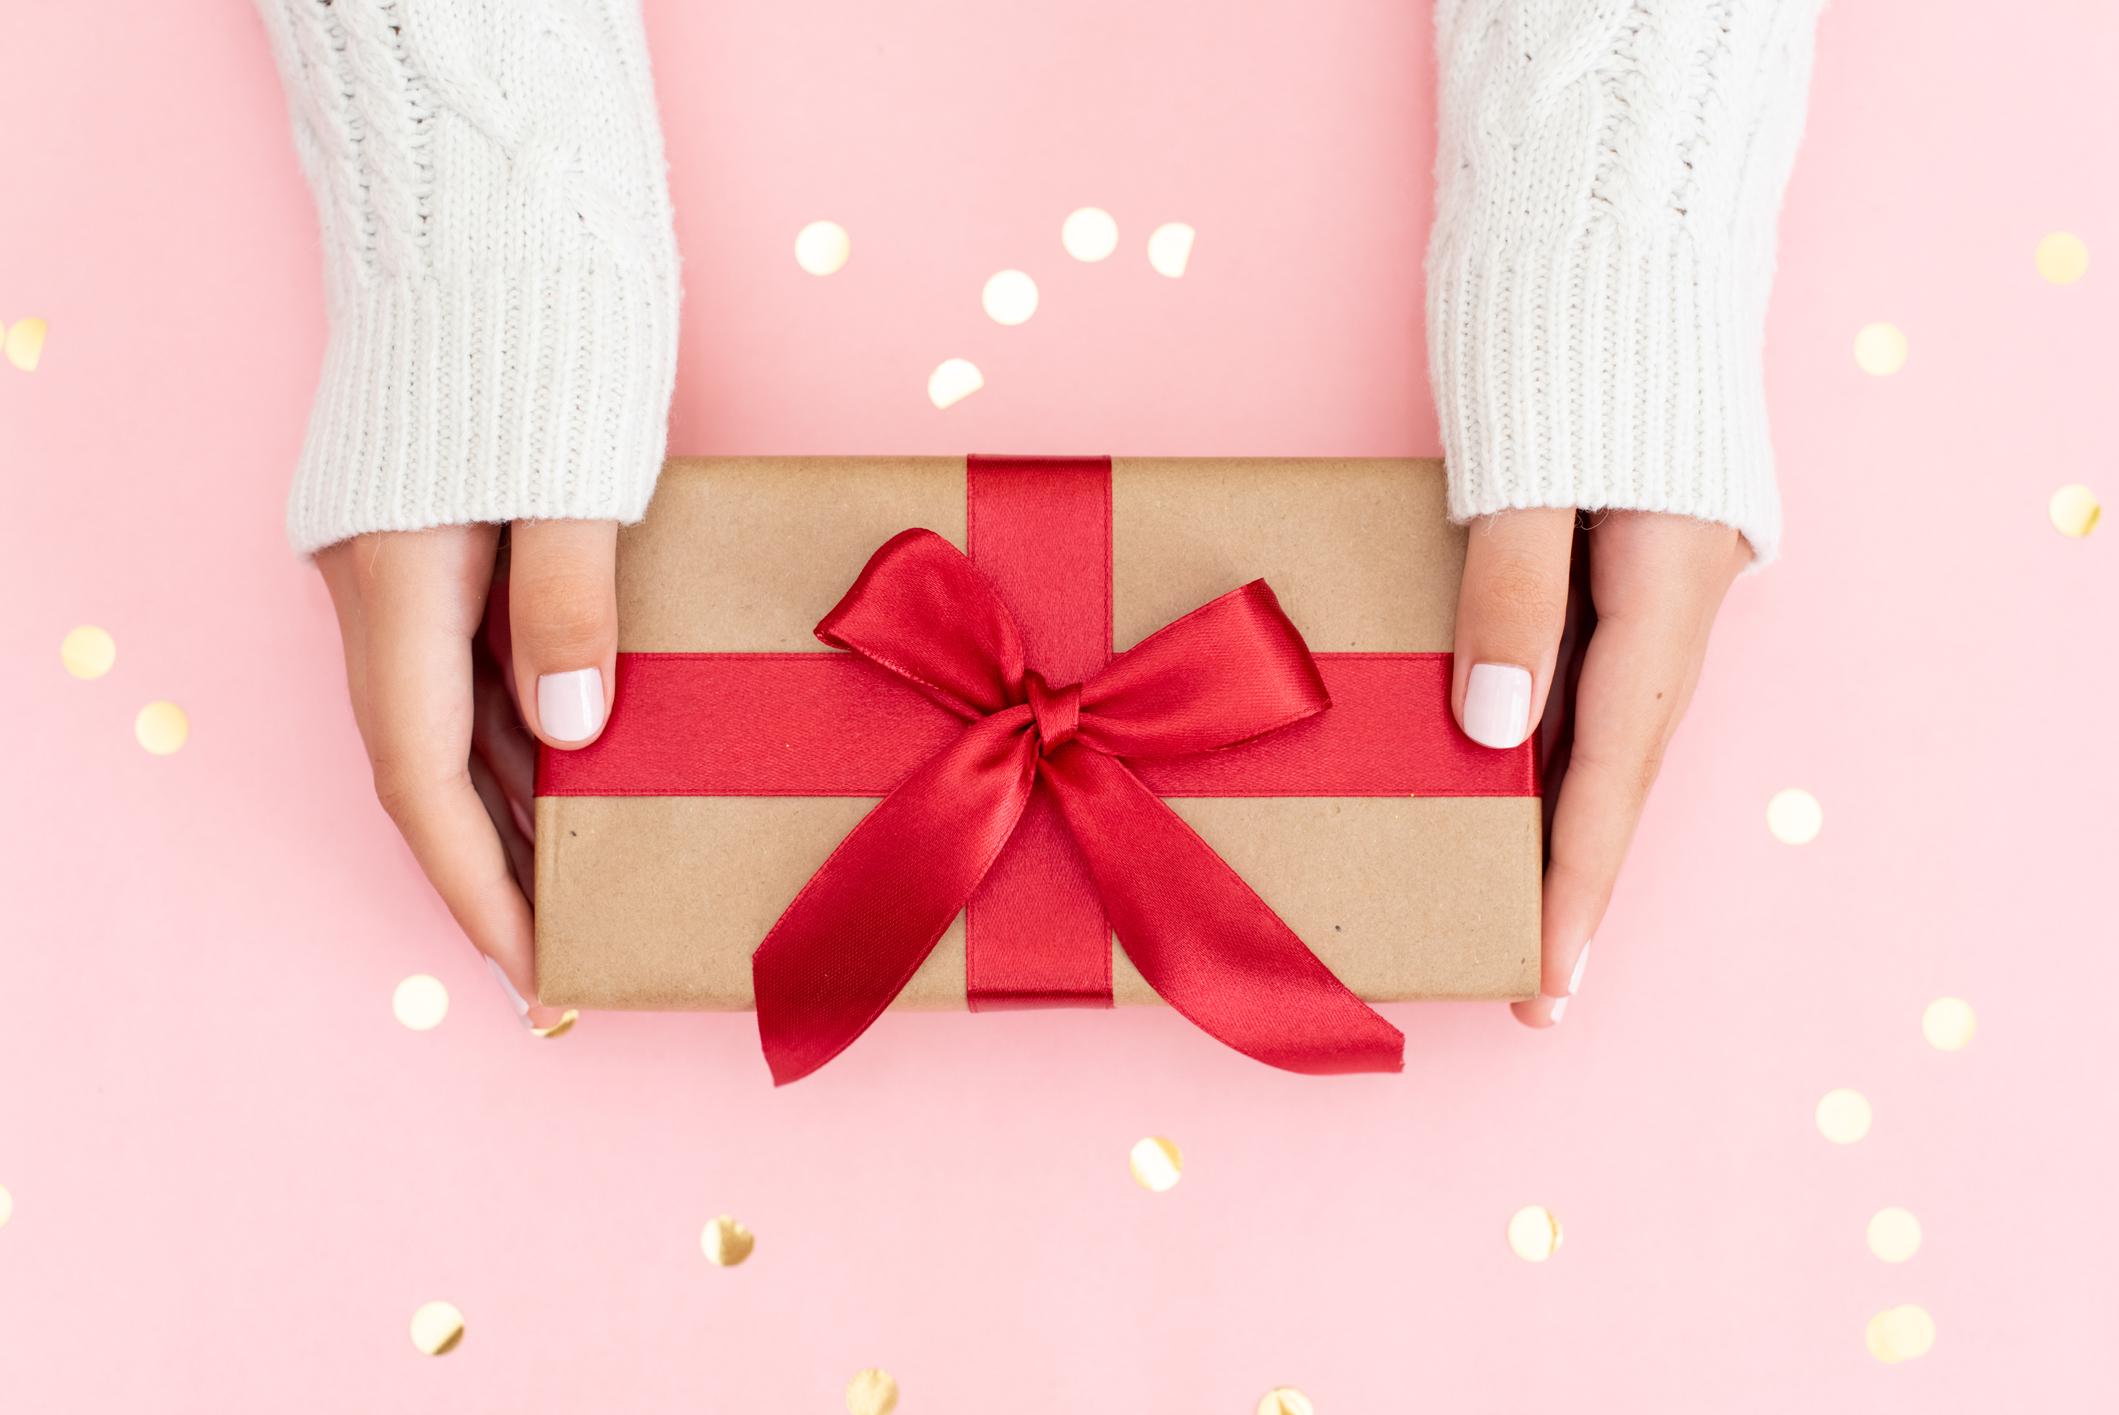 notonthehighstreet fashion gifts edit